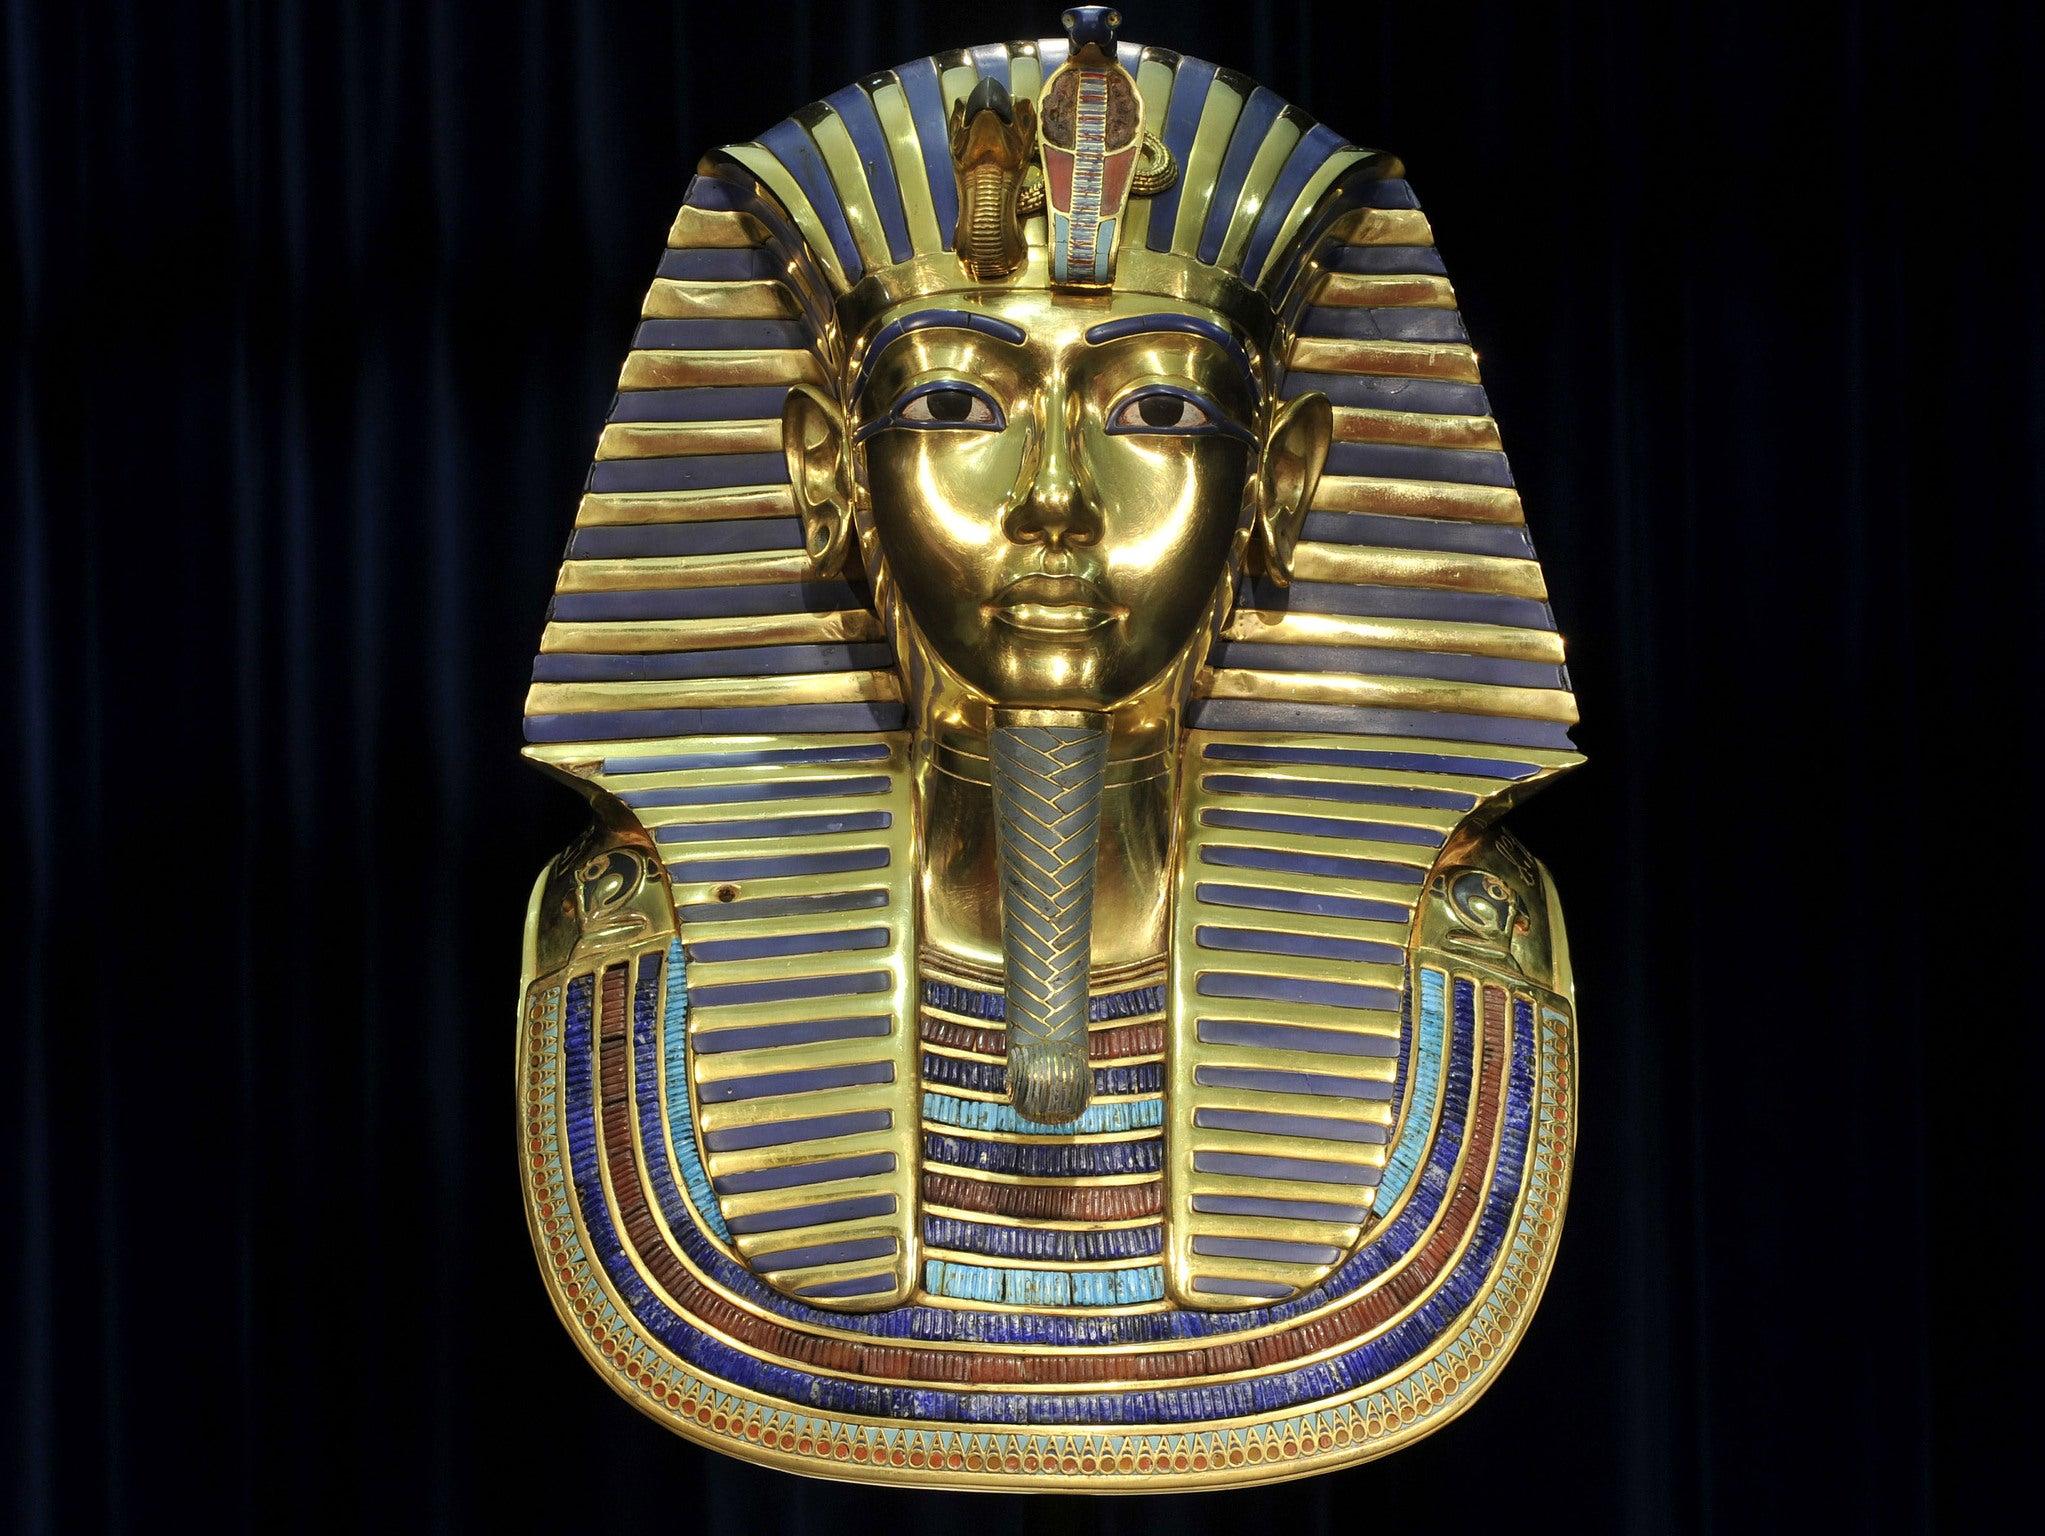 1,323 BC / Gold Mask of Tutankhamun